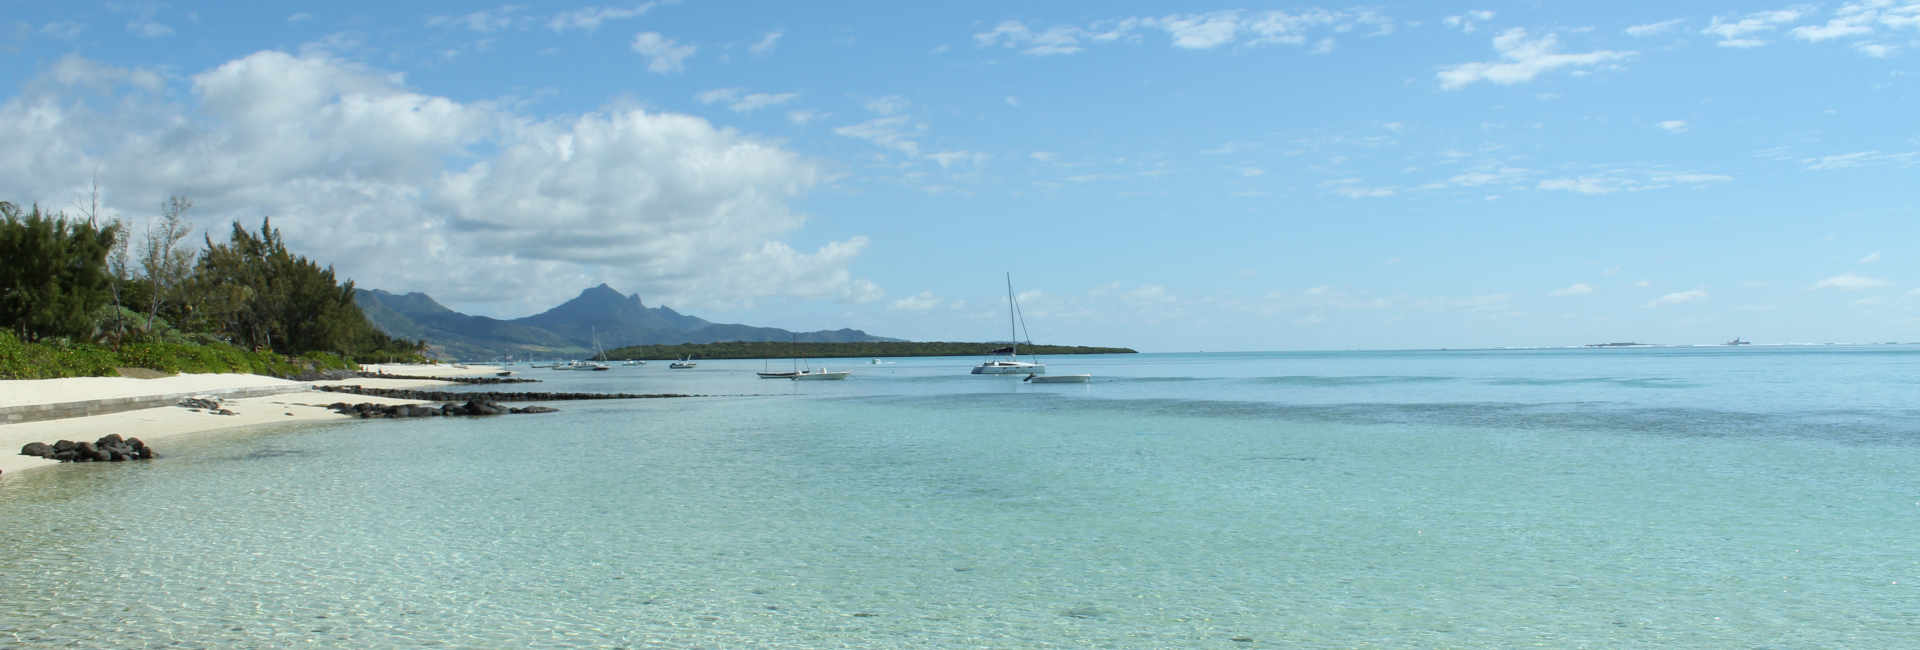 Pointe d'Esny Ile Maurice